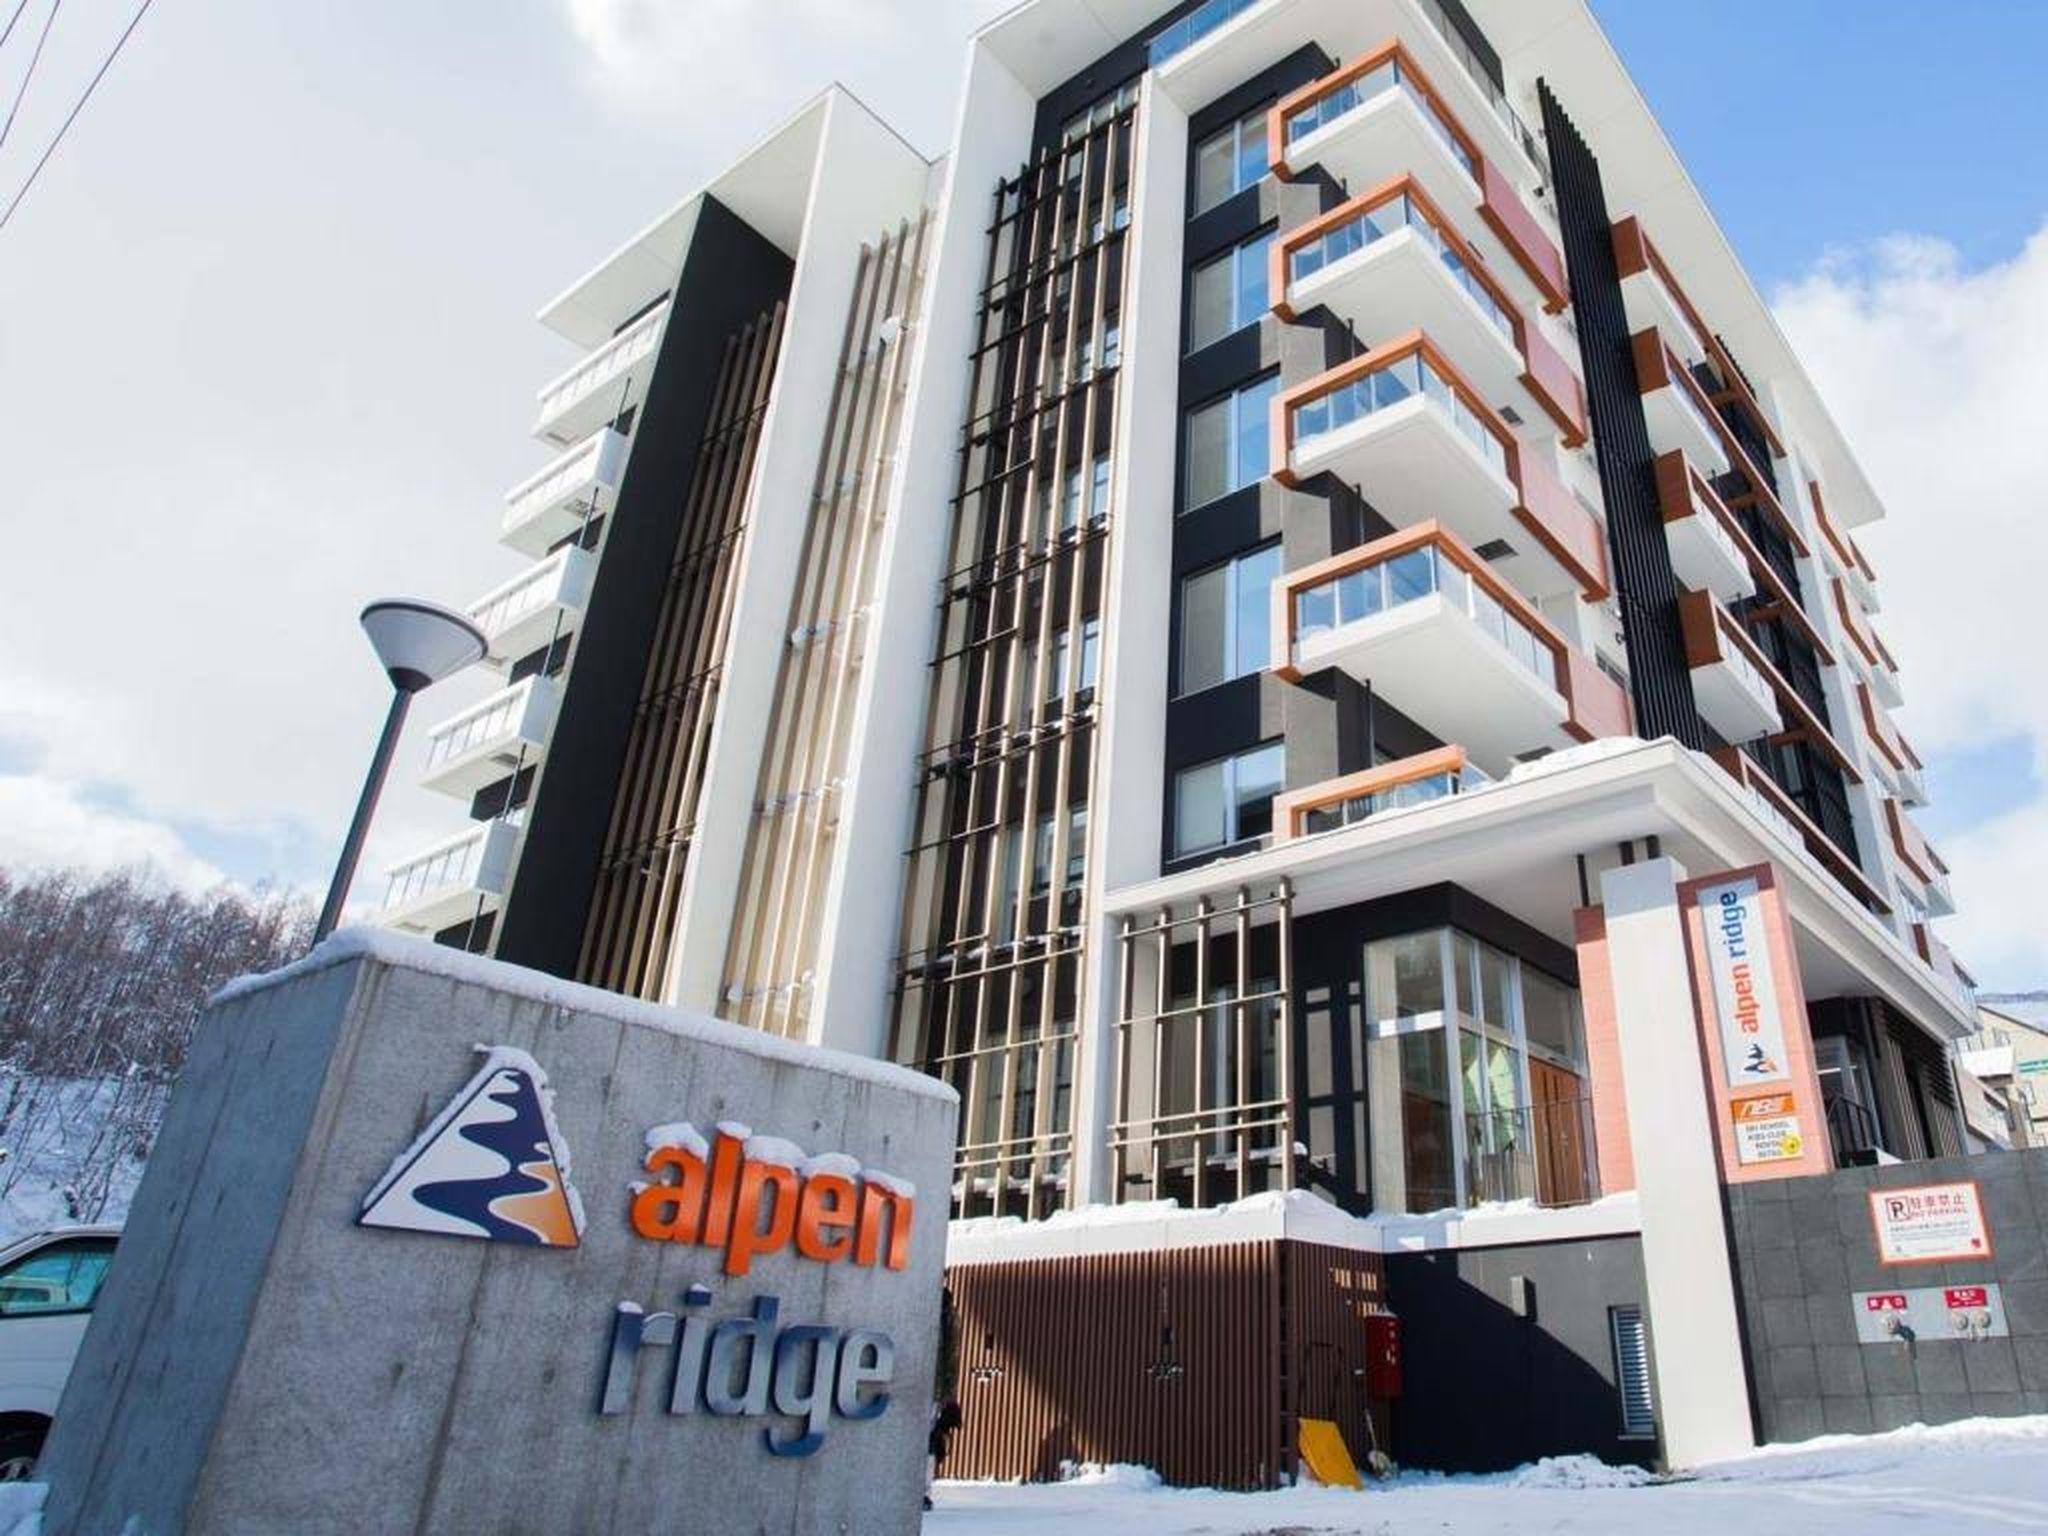 Alpen Ridge Apartments